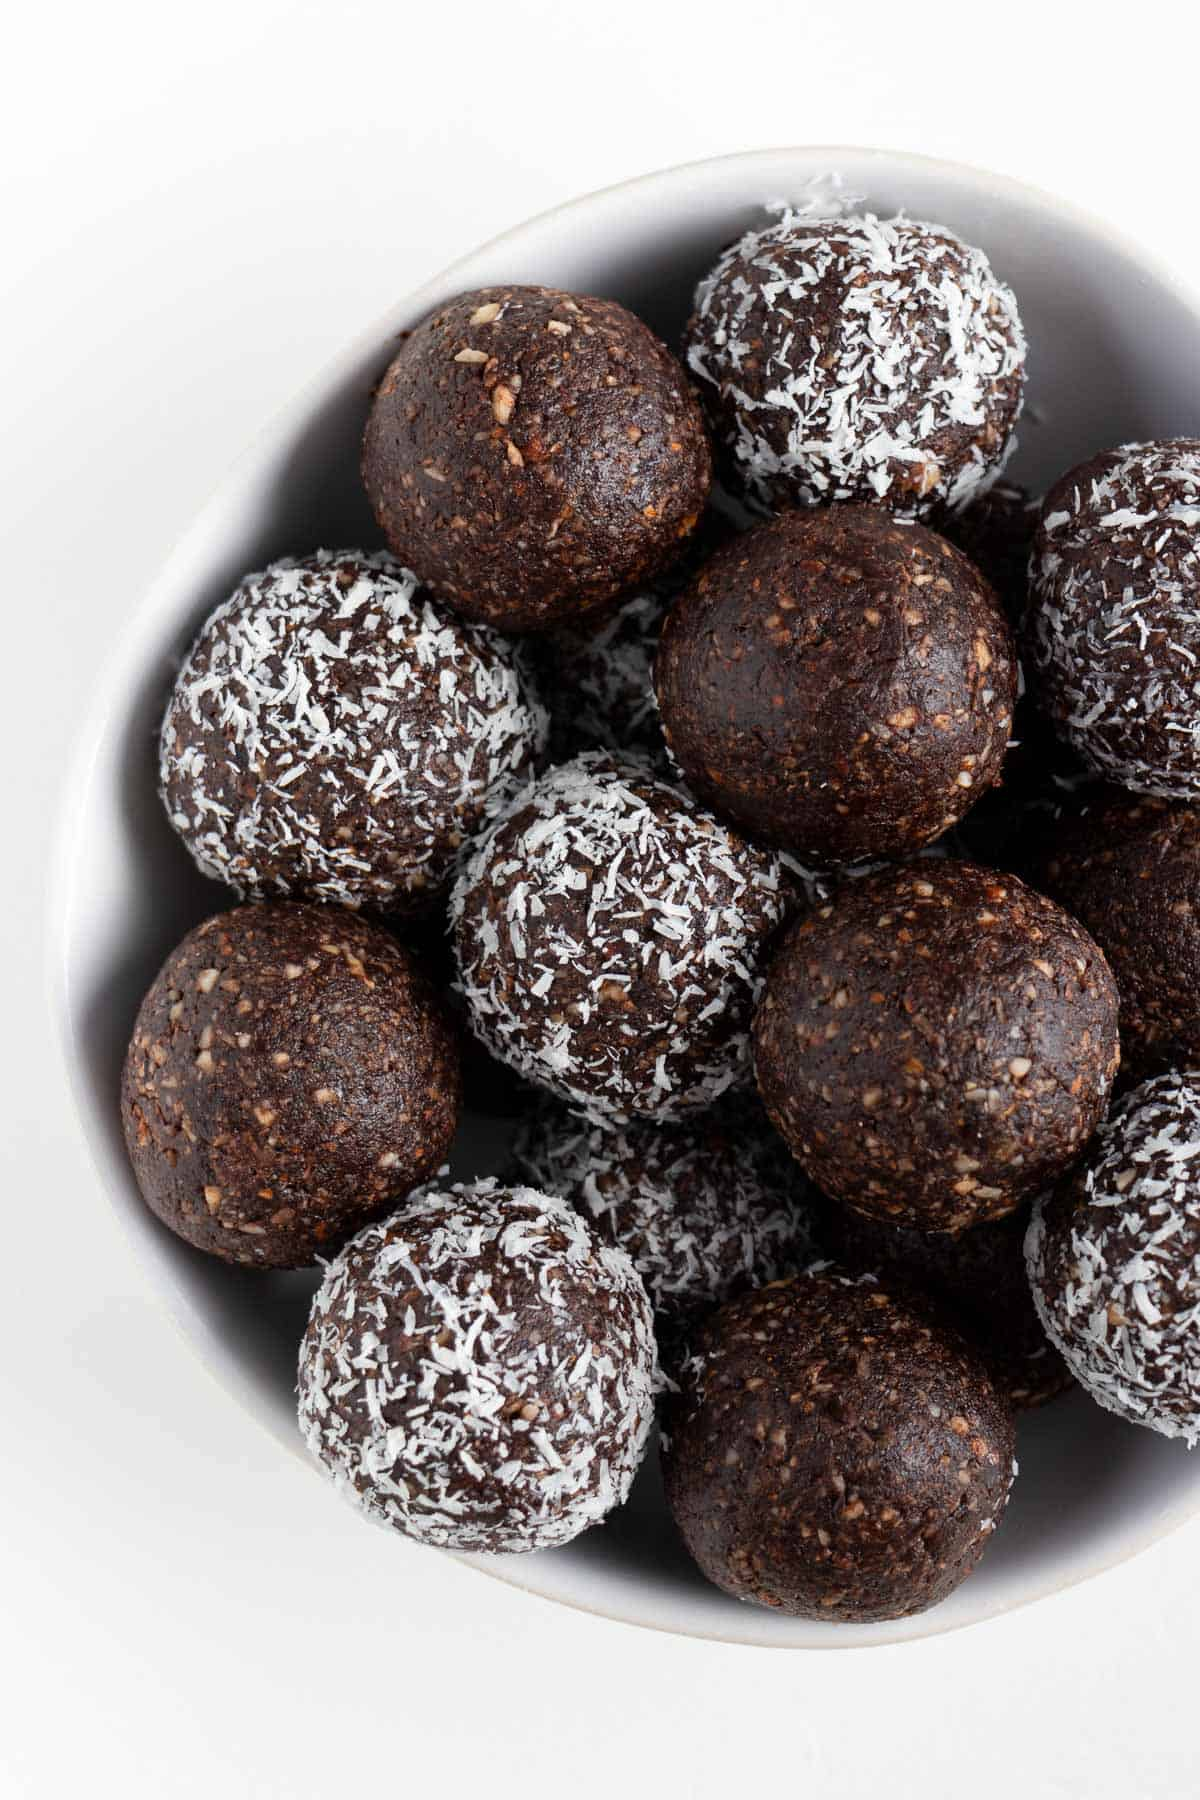 chocolate coconut energy balls inside a white bowl